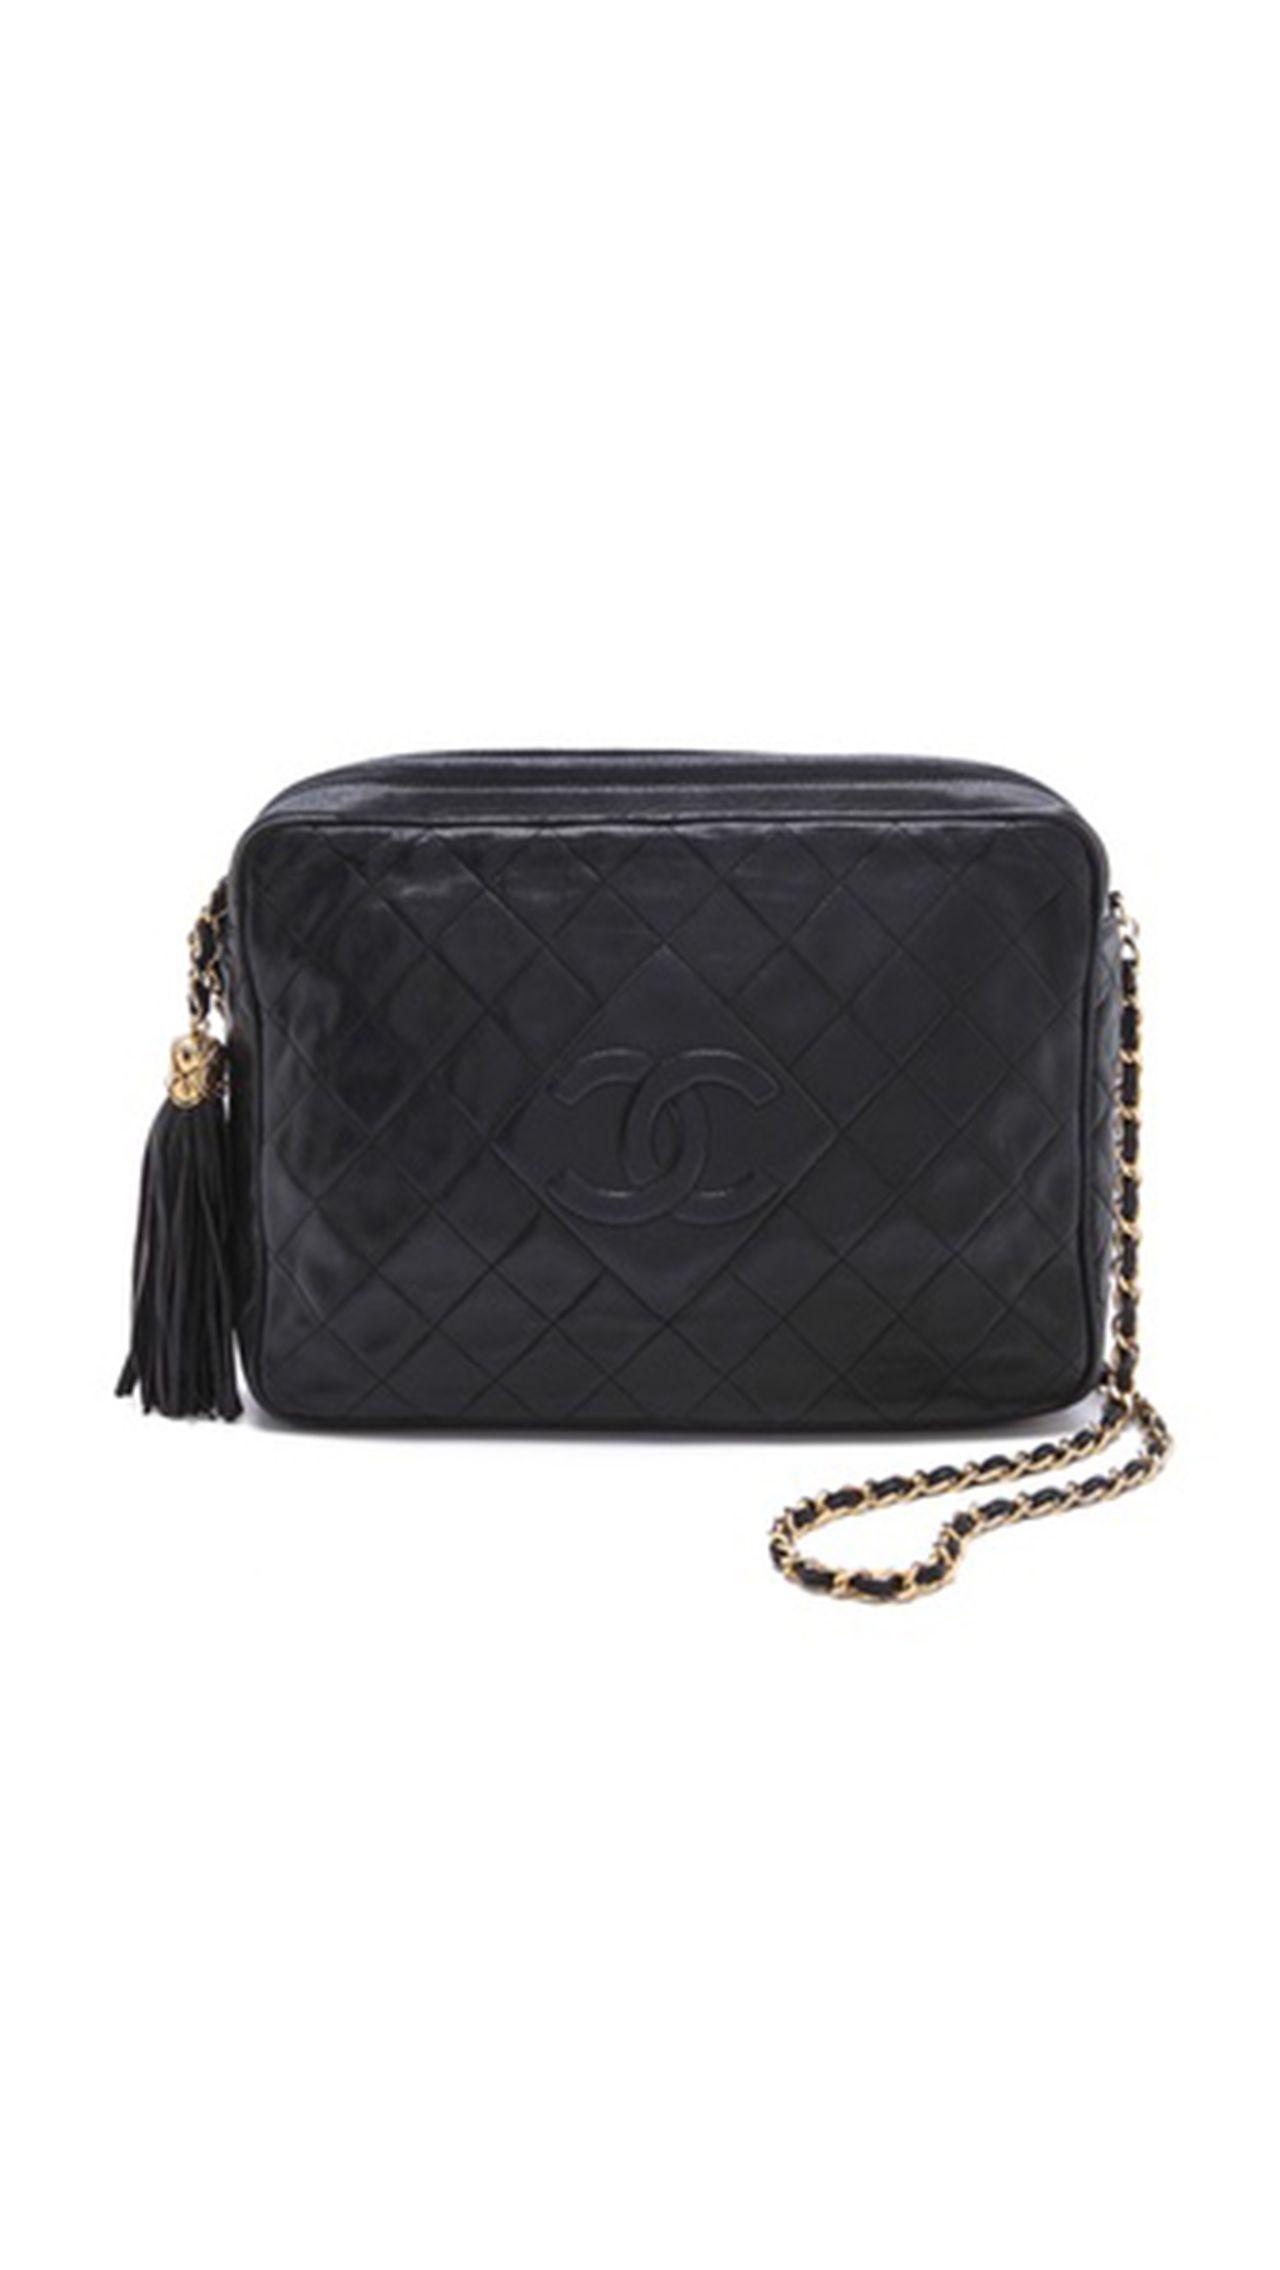 replica bottega veneta handbags wallet benefit recovery